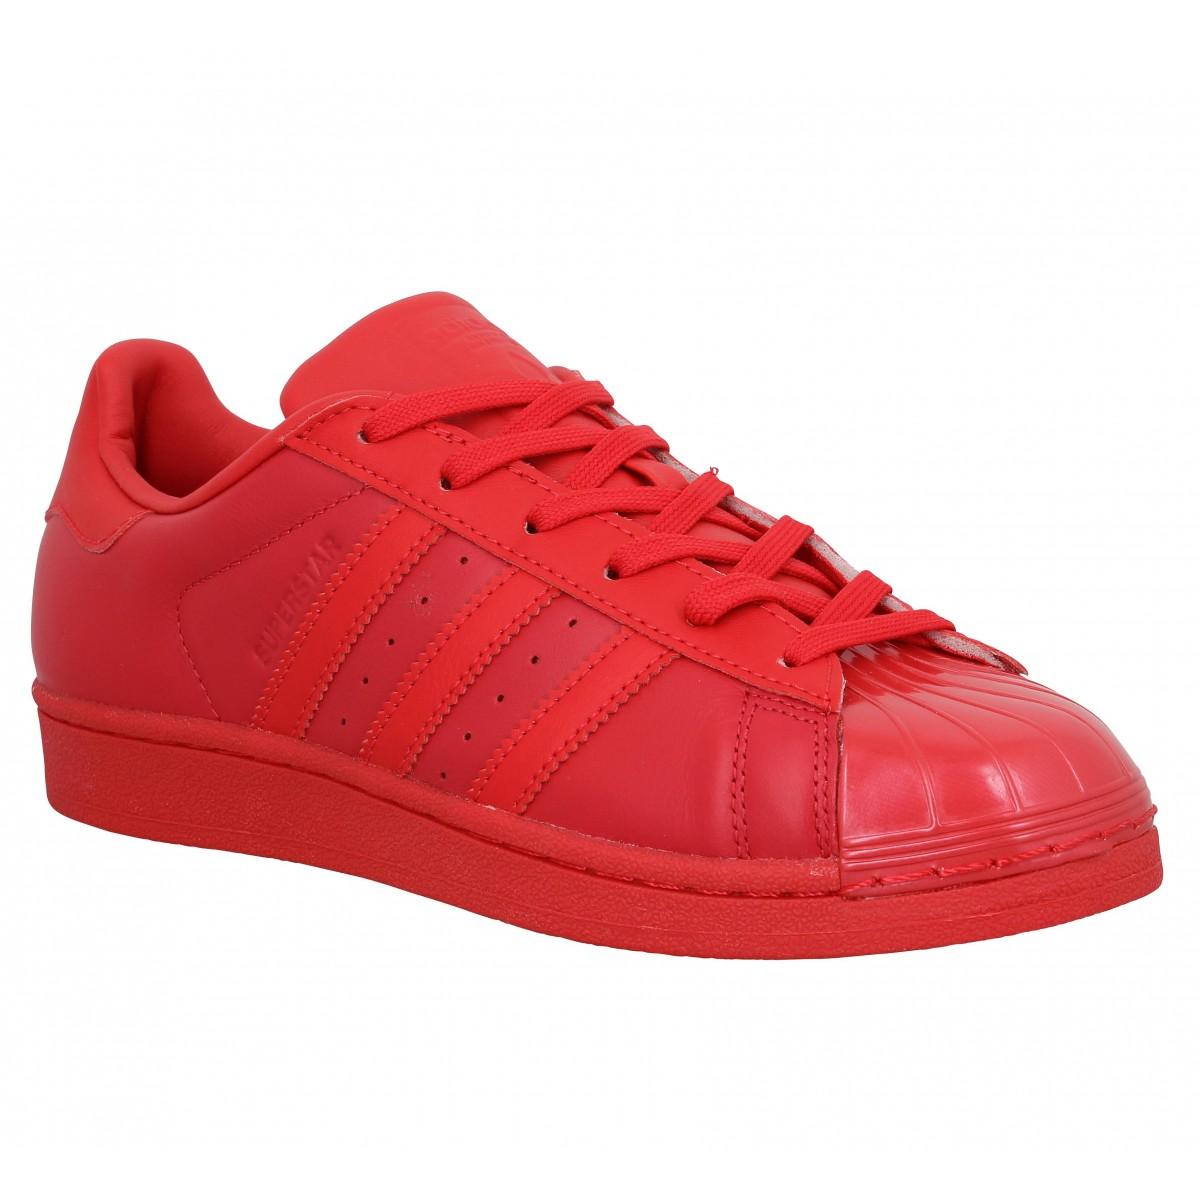 adidas superstar tout rouge